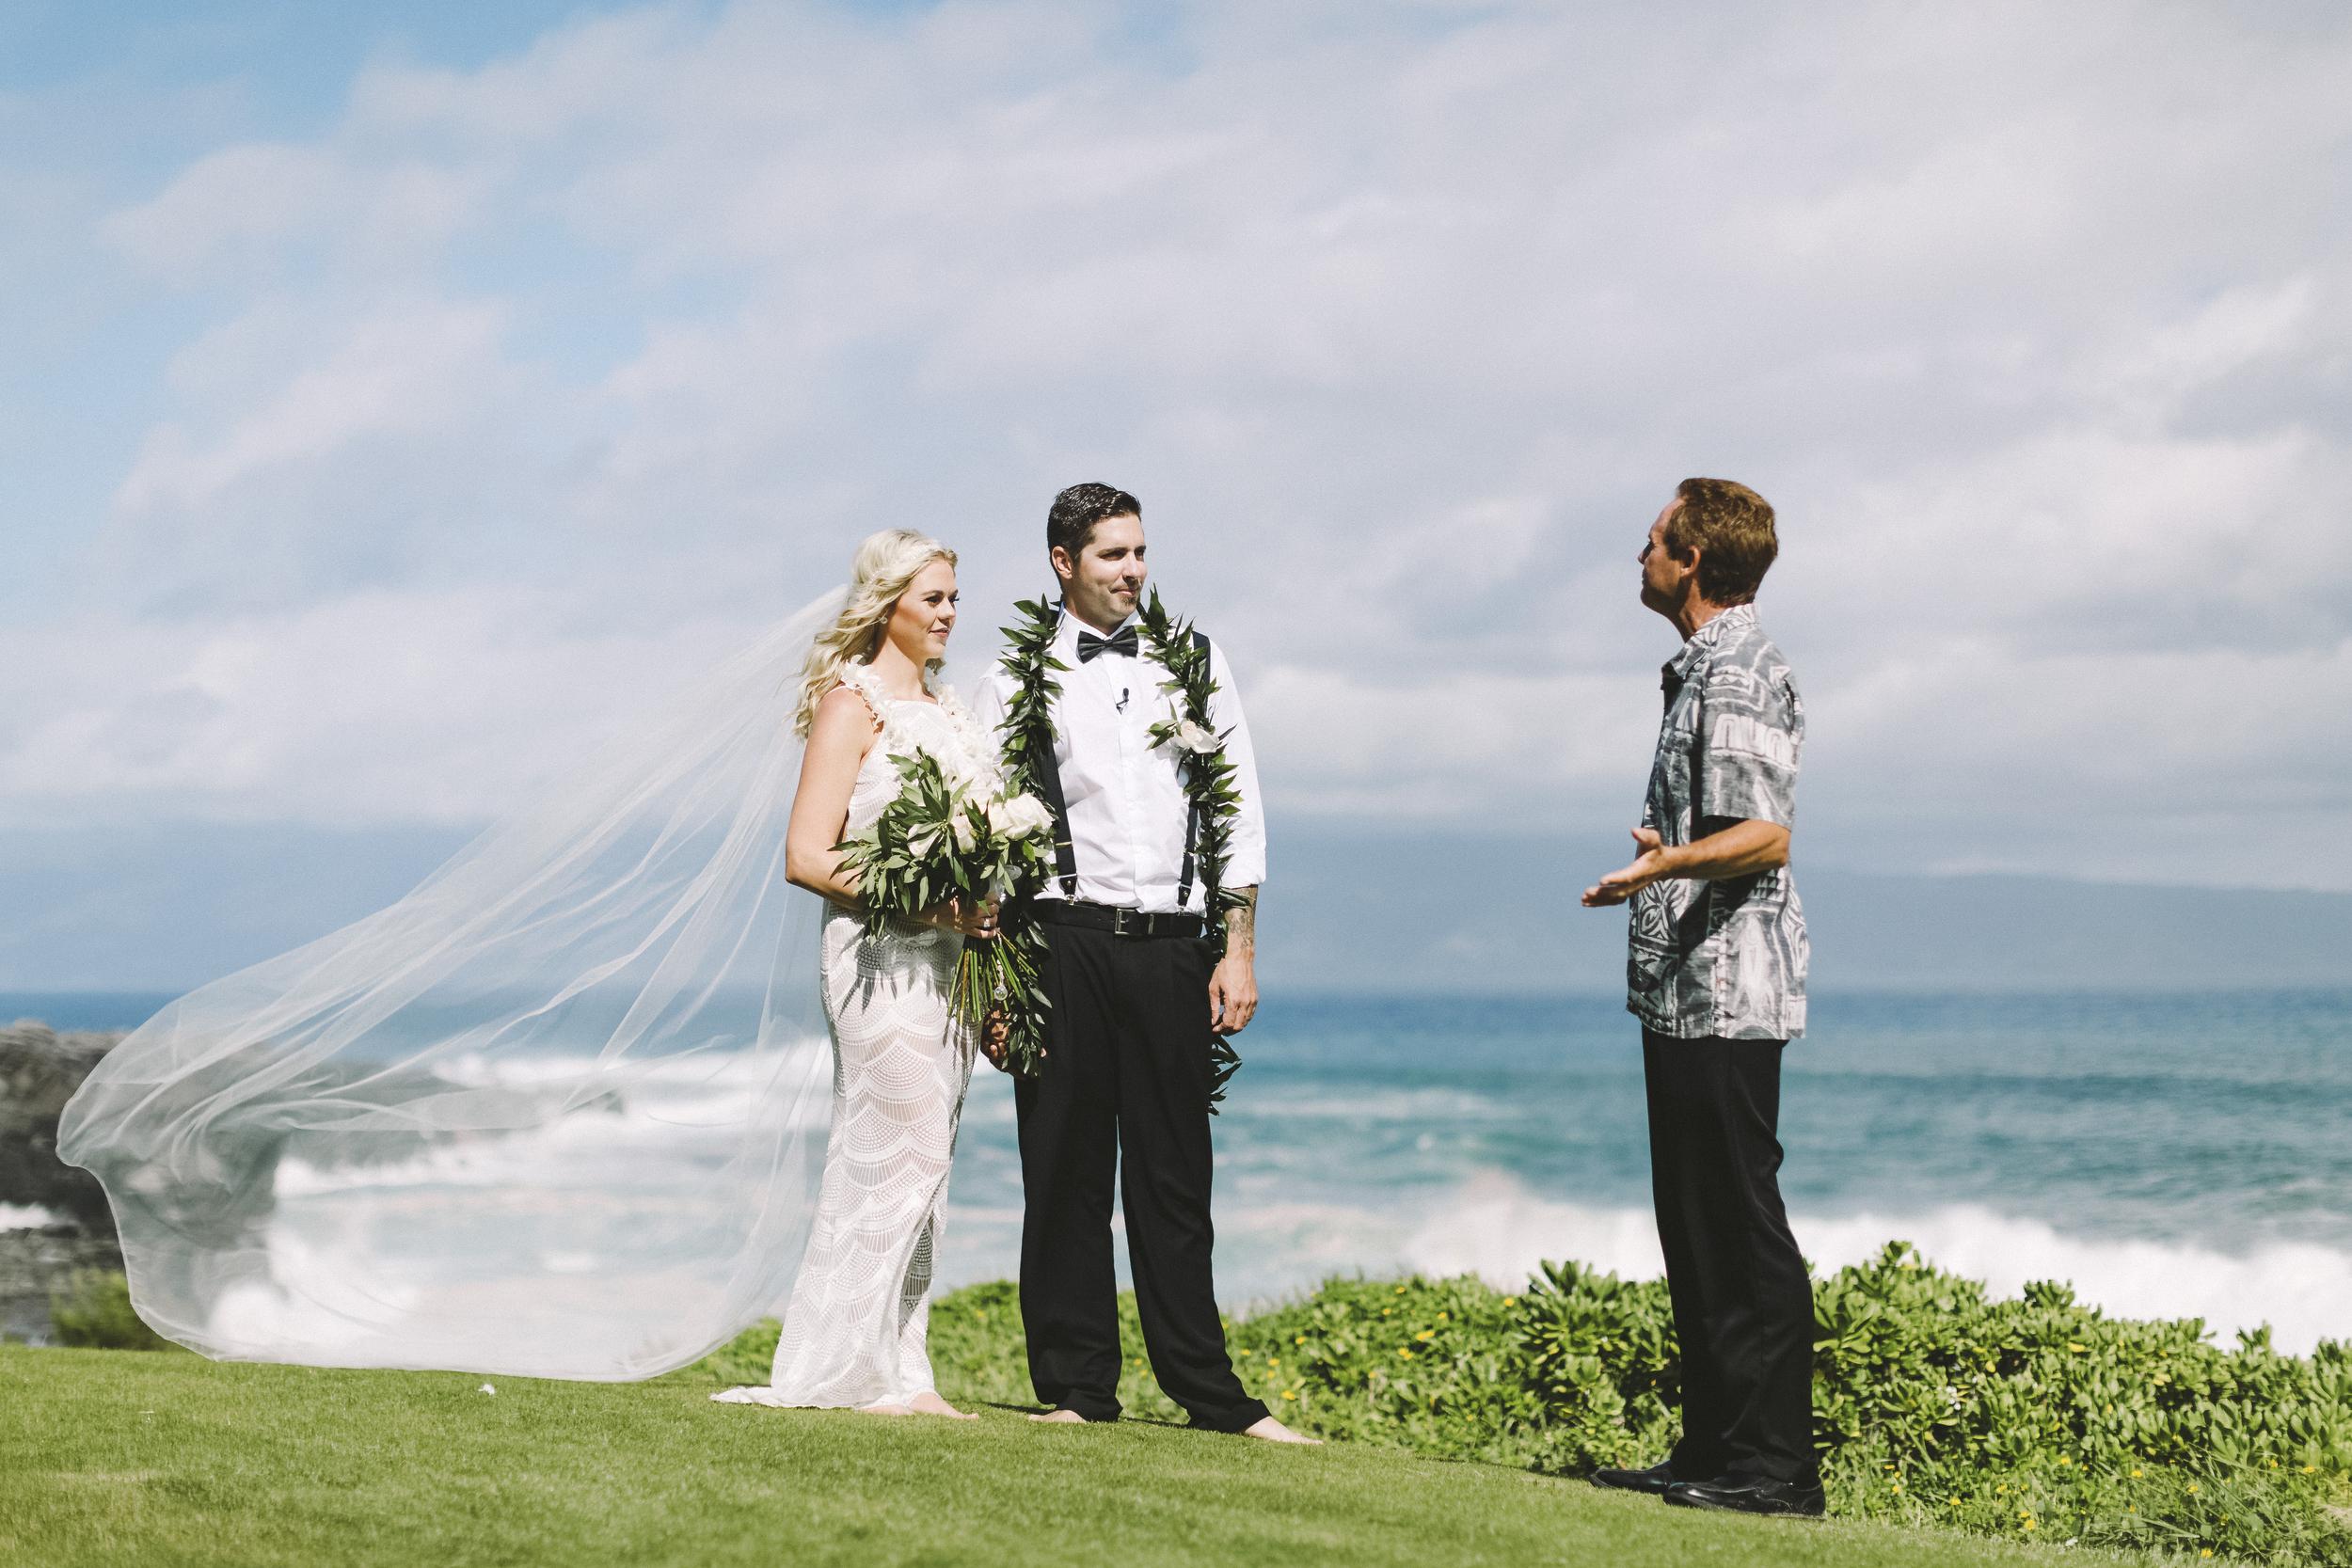 angie-diaz-photography-hawaii-wedding-13.jpg